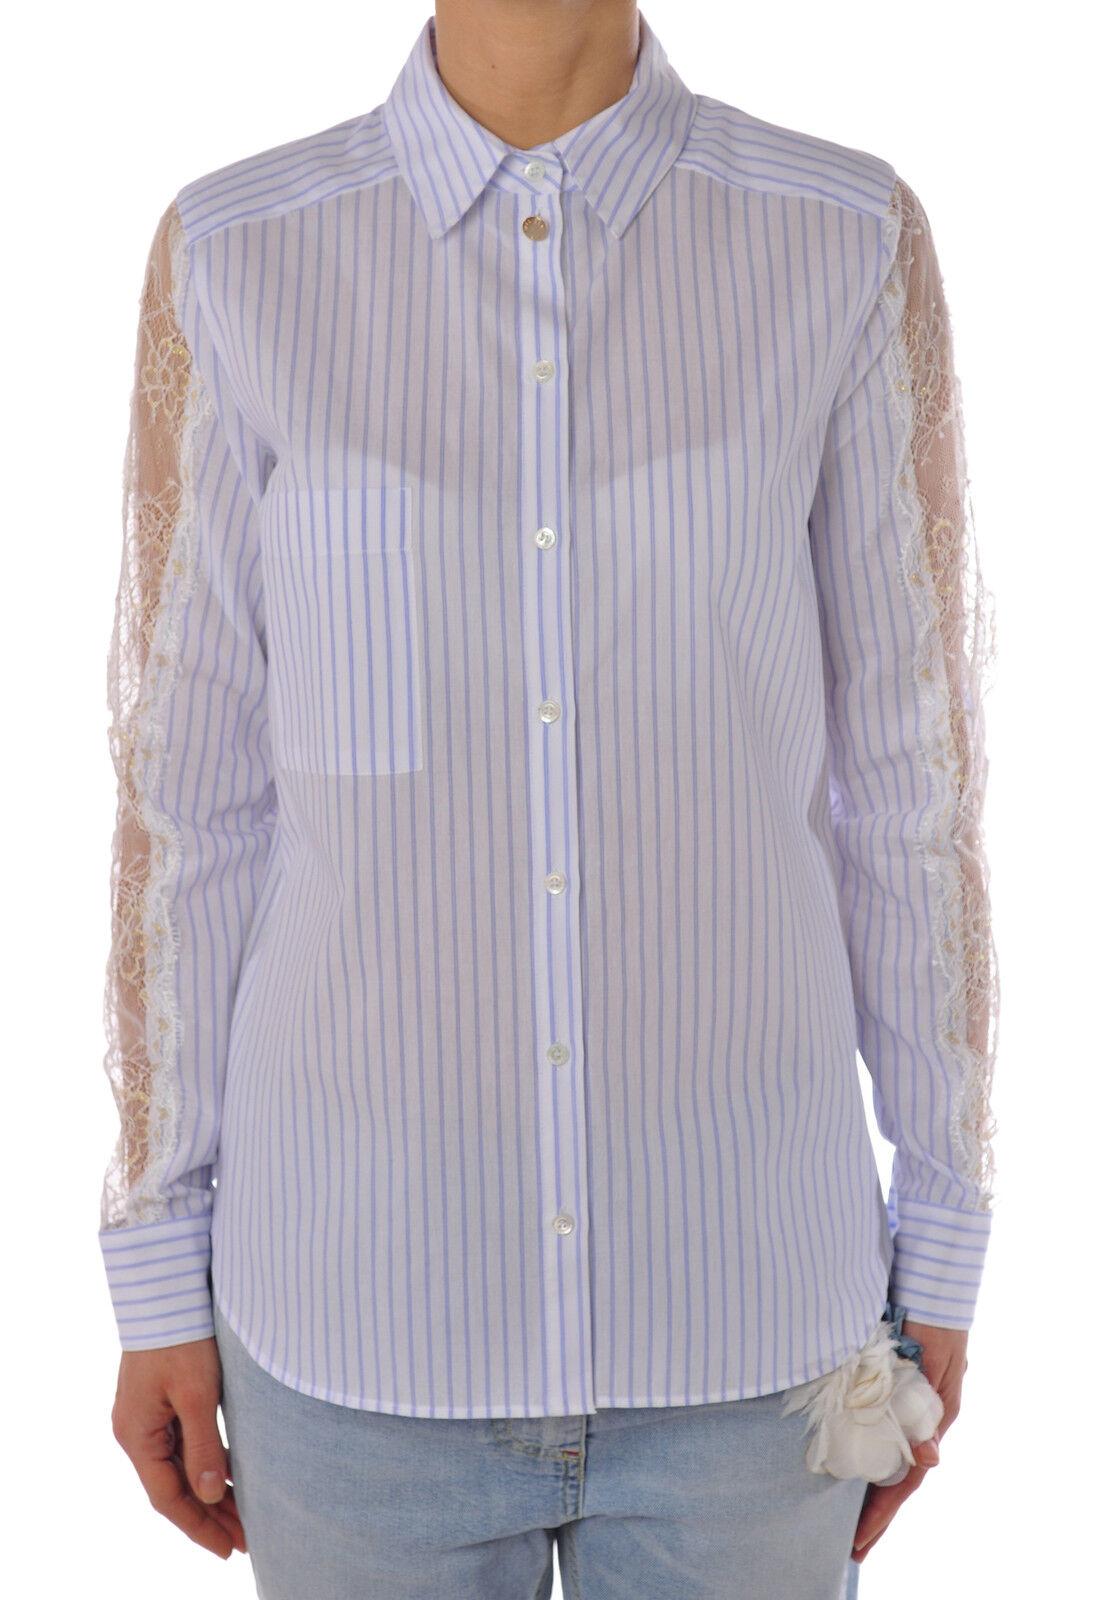 Patrizia Pepe  -  Shirt - Female - 42 - Weiß - 1377405B161036